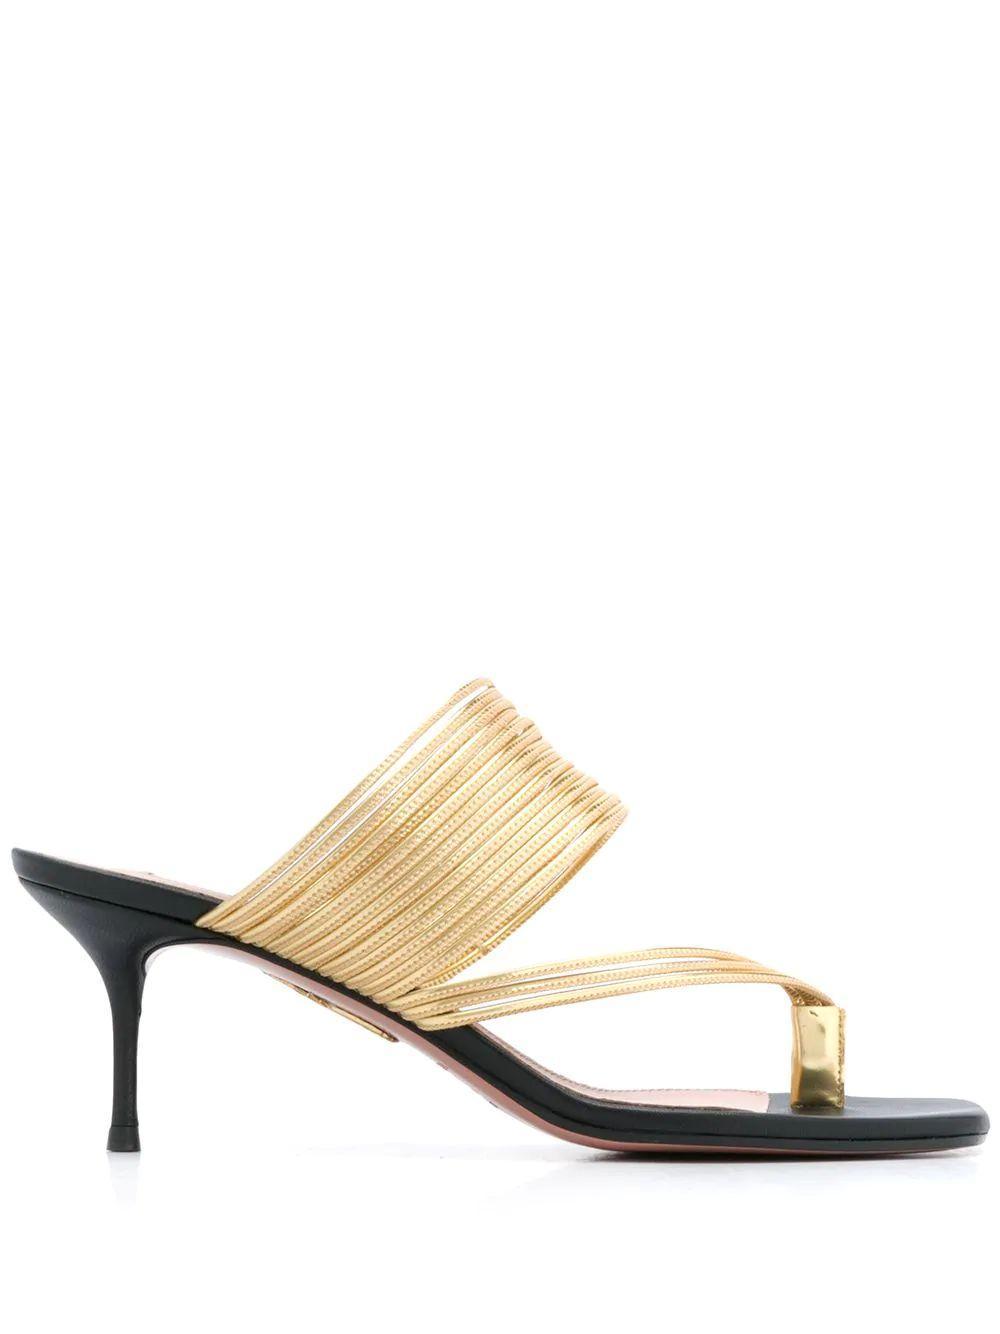 Sunny 60mm Thong Sandal Item # SNYMIDS0-NSP